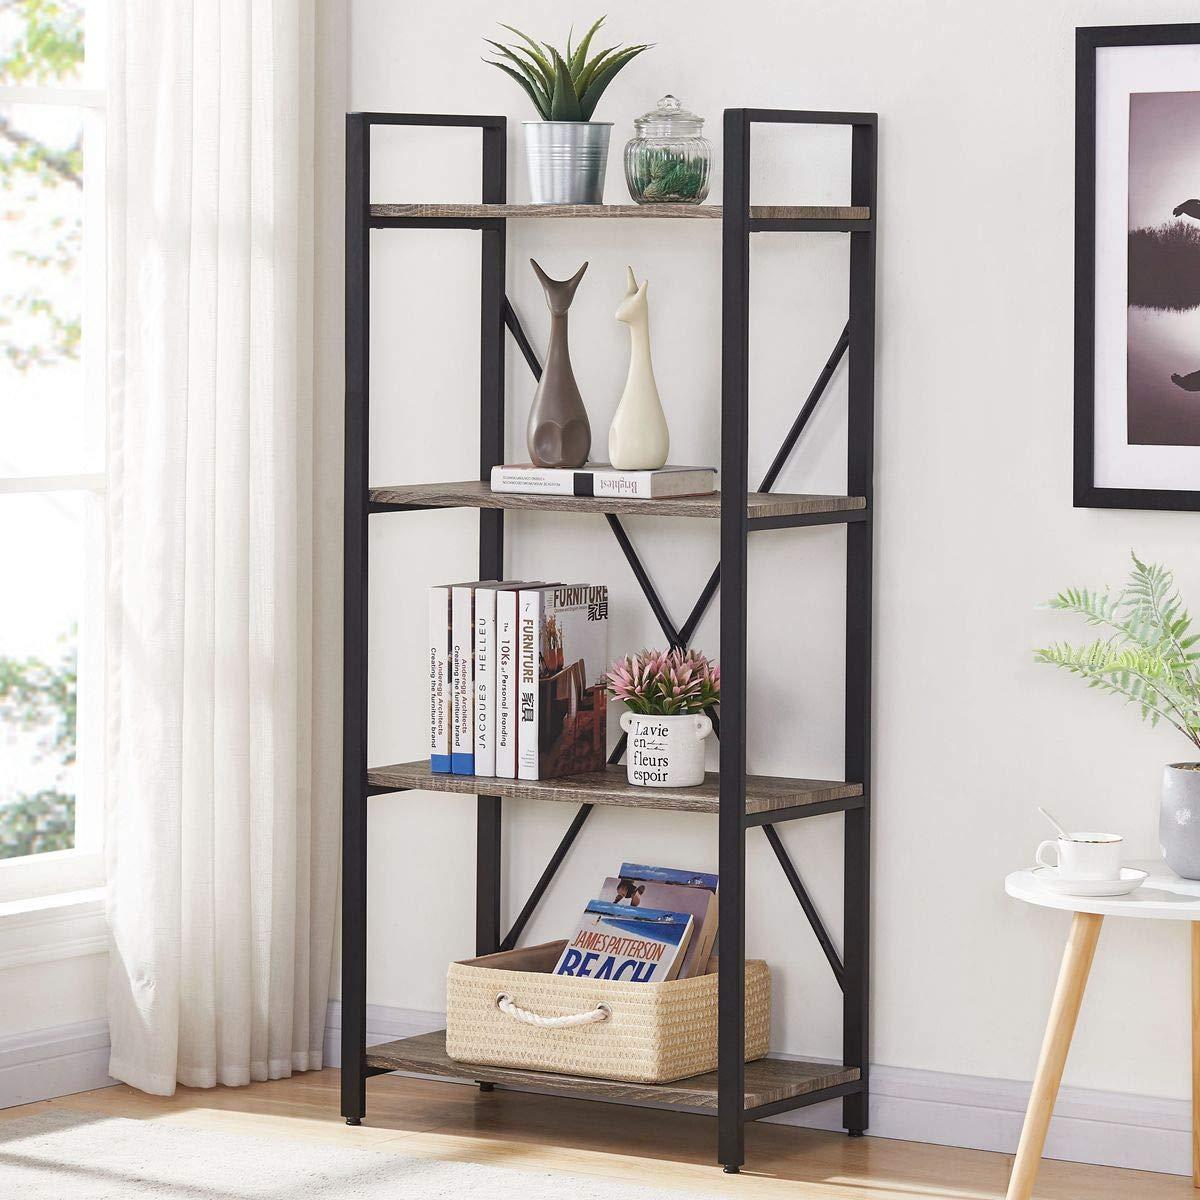 BON AUGURE 4-Shelf Open Narrow Bookcase, Vintage Industrial Bookshelf, Multipurpose Storage Shelves, Dark Oak